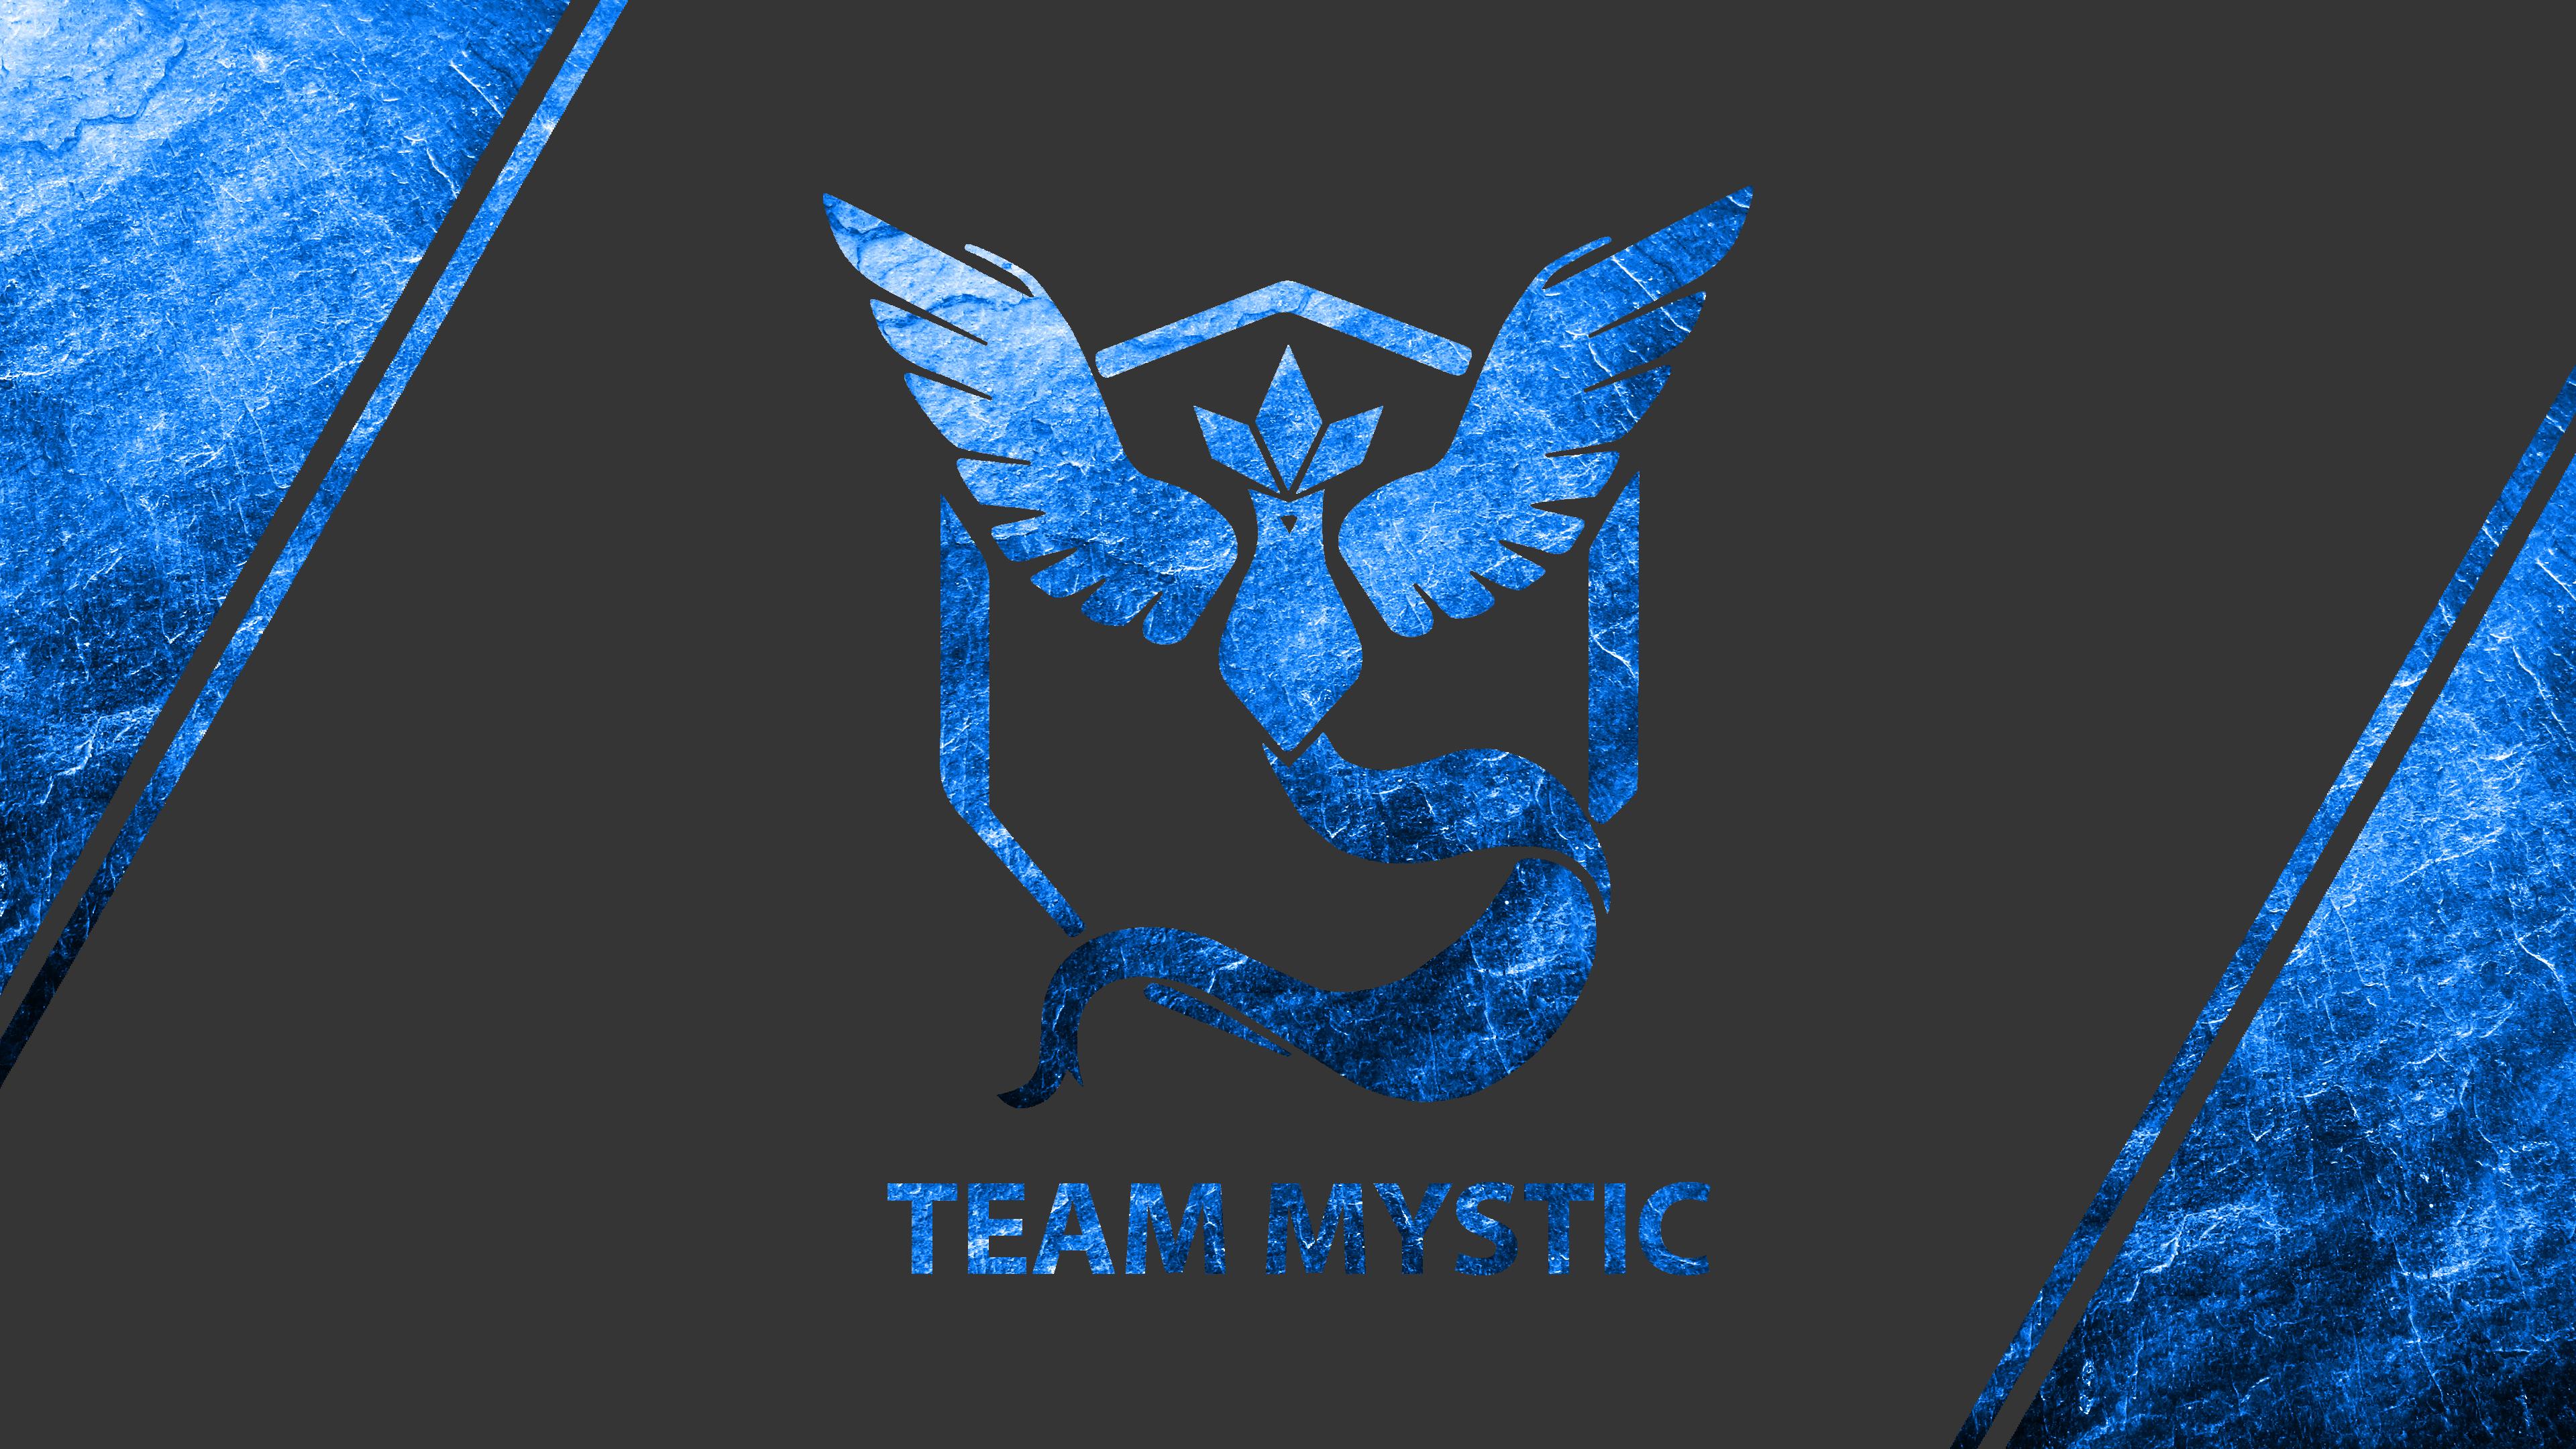 Team Mystic Ice Texture Wallpaper 4k Ultra HD Wallpaper ...